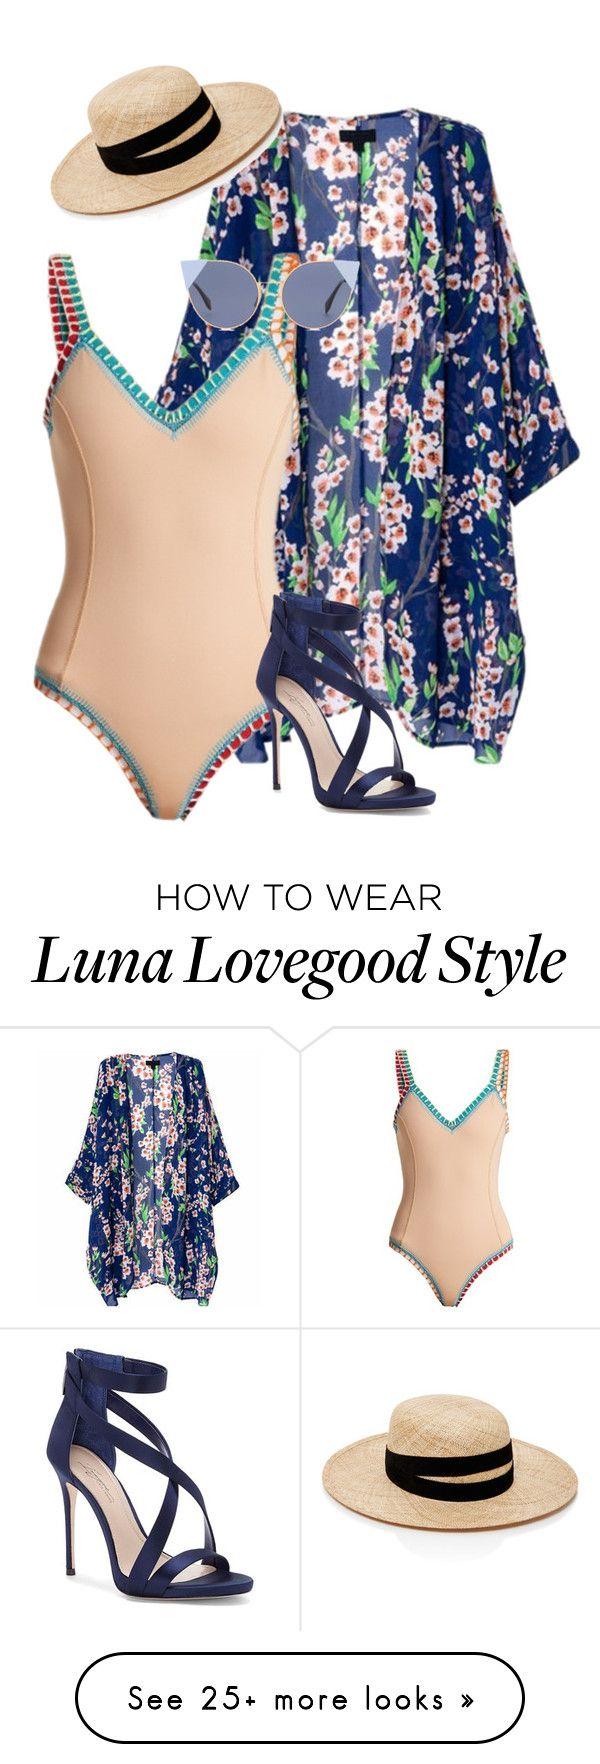 """Luna Lovegood inspired"" by samtiritilli on Polyvore featuring kiini, Imagine by Vince Camuto, Fendi and Janessa Leone"